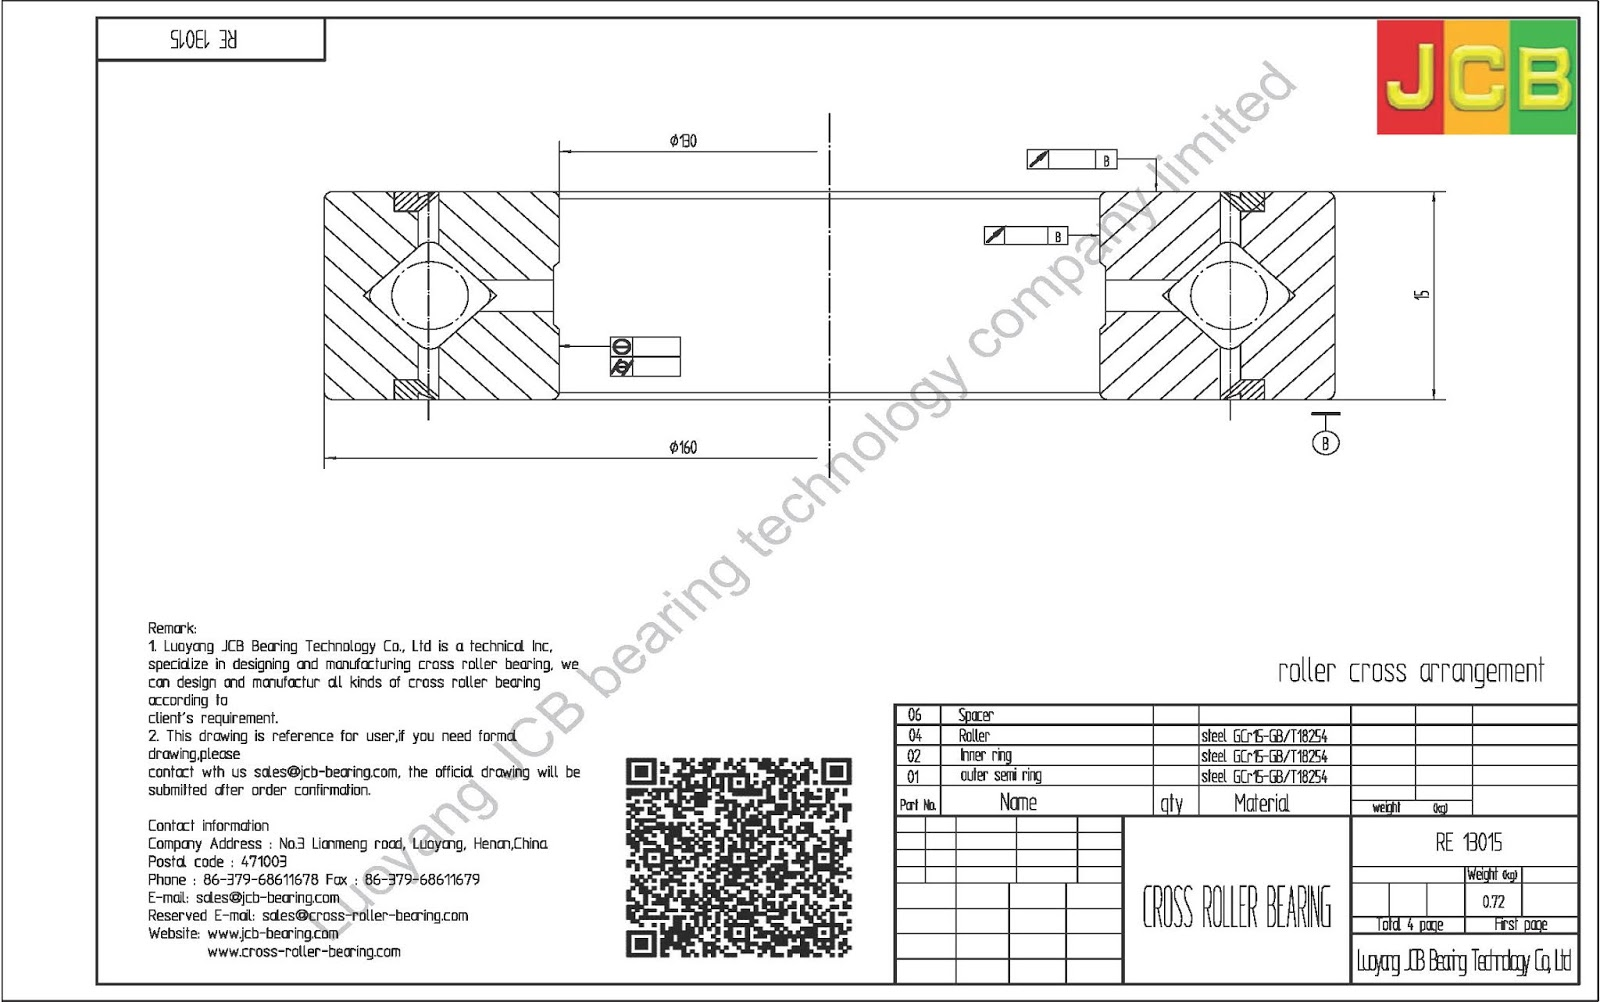 THK Cross roller bearing: Supply RE 13015 of THK cross